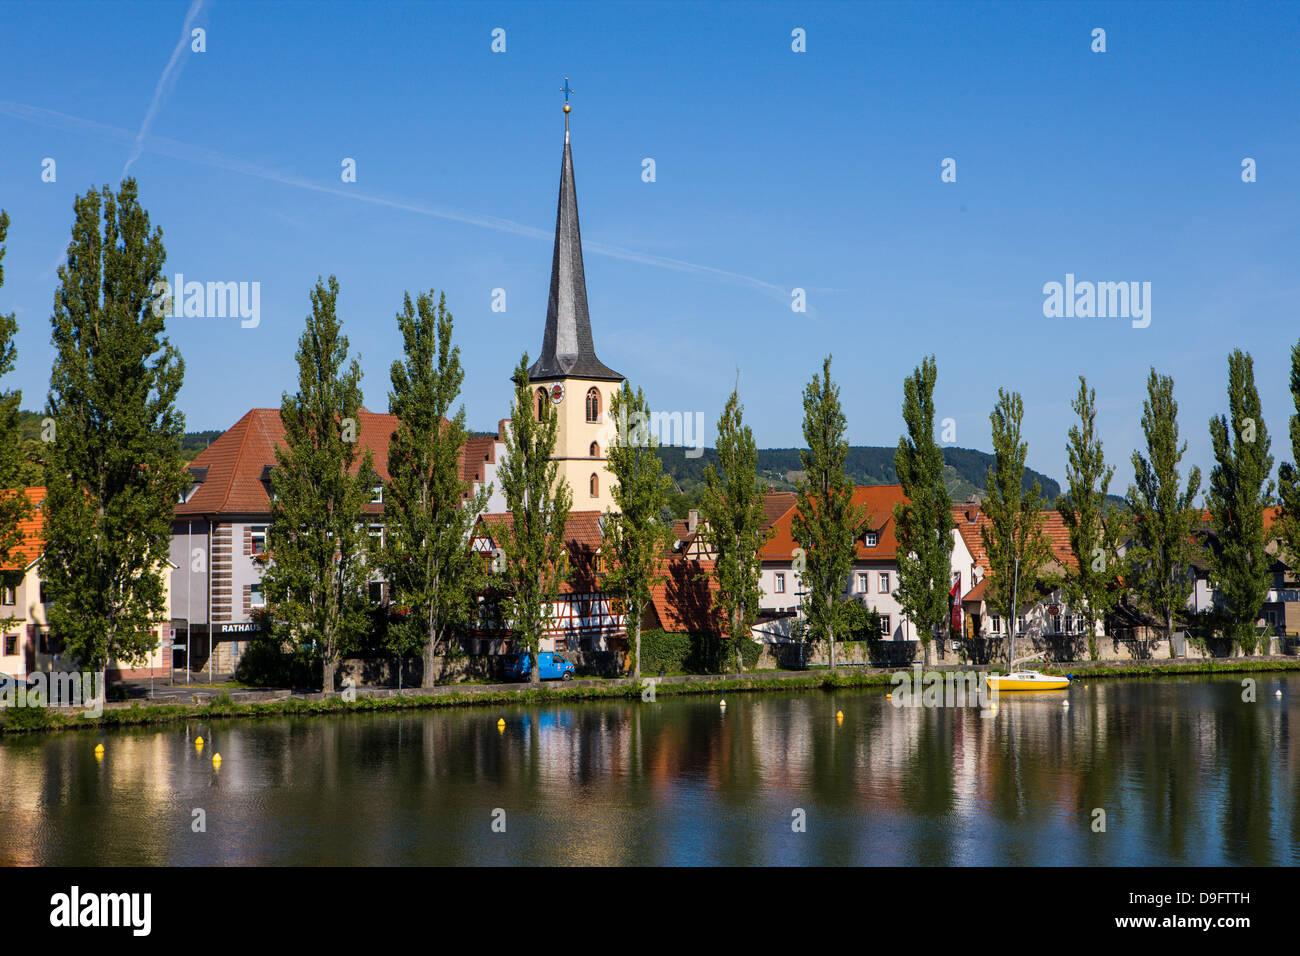 Lohr am Main in the Main valley, Franconia, Bavaria, Germany - Stock Image